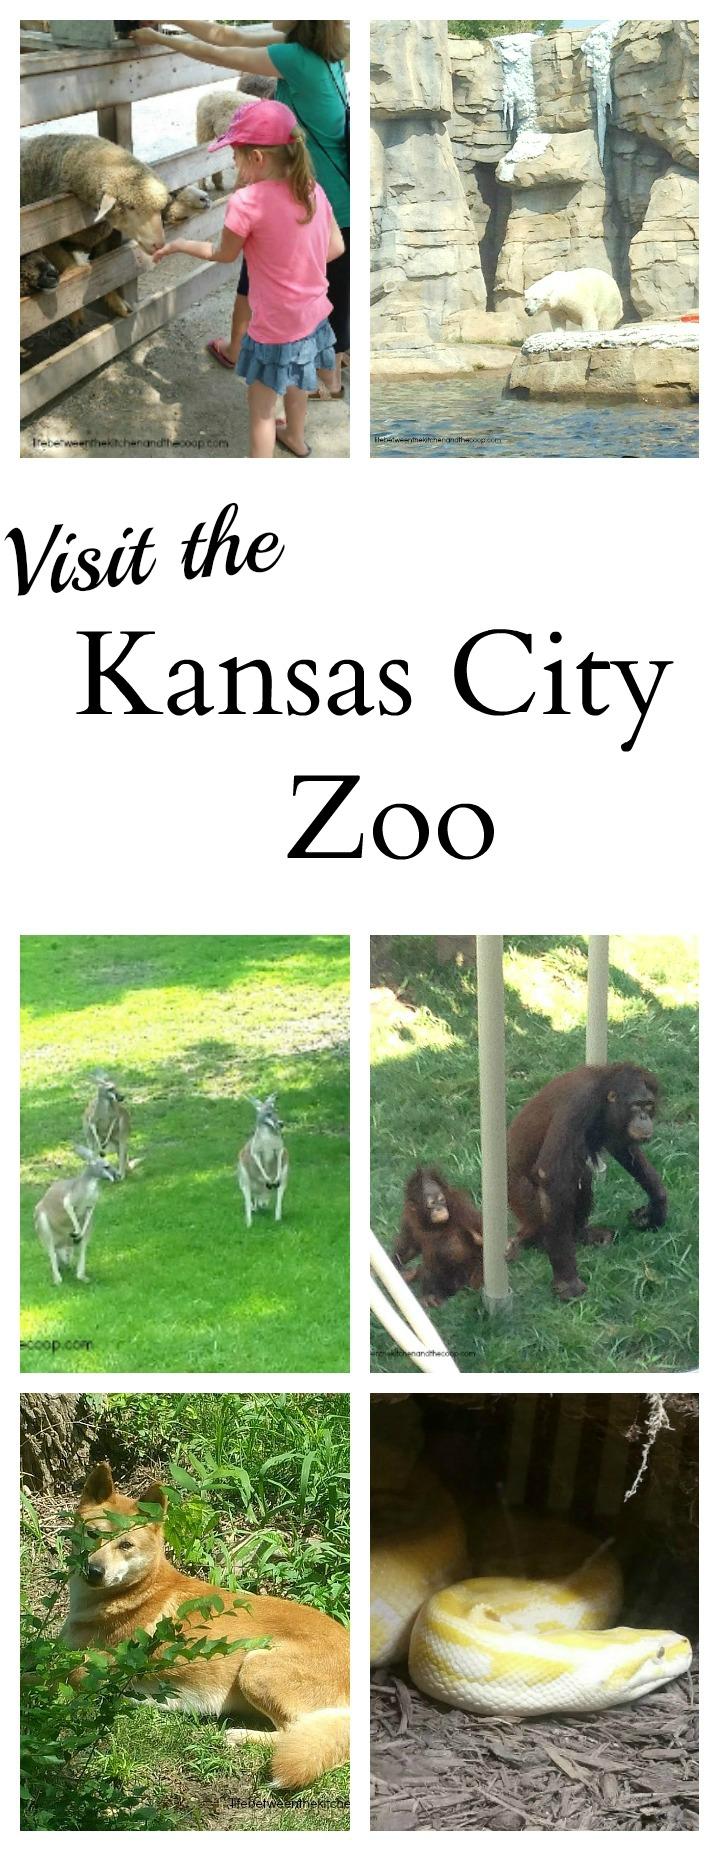 Visit kansas city zoo Garden city zoo